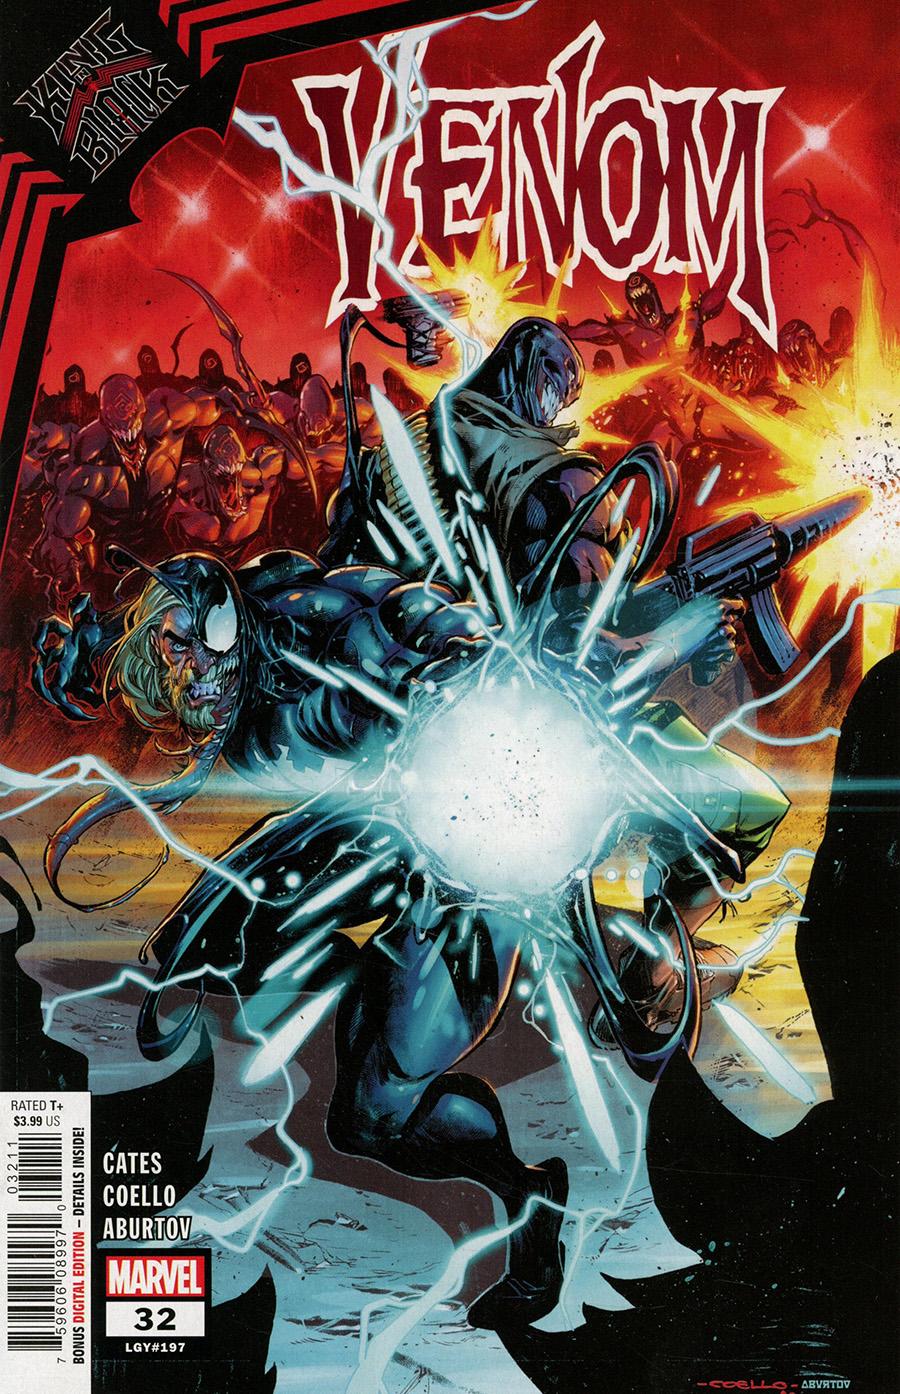 Venom Vol 4 #32 Cover A Regular Iban Coello Cover (King In Black Tie-In)